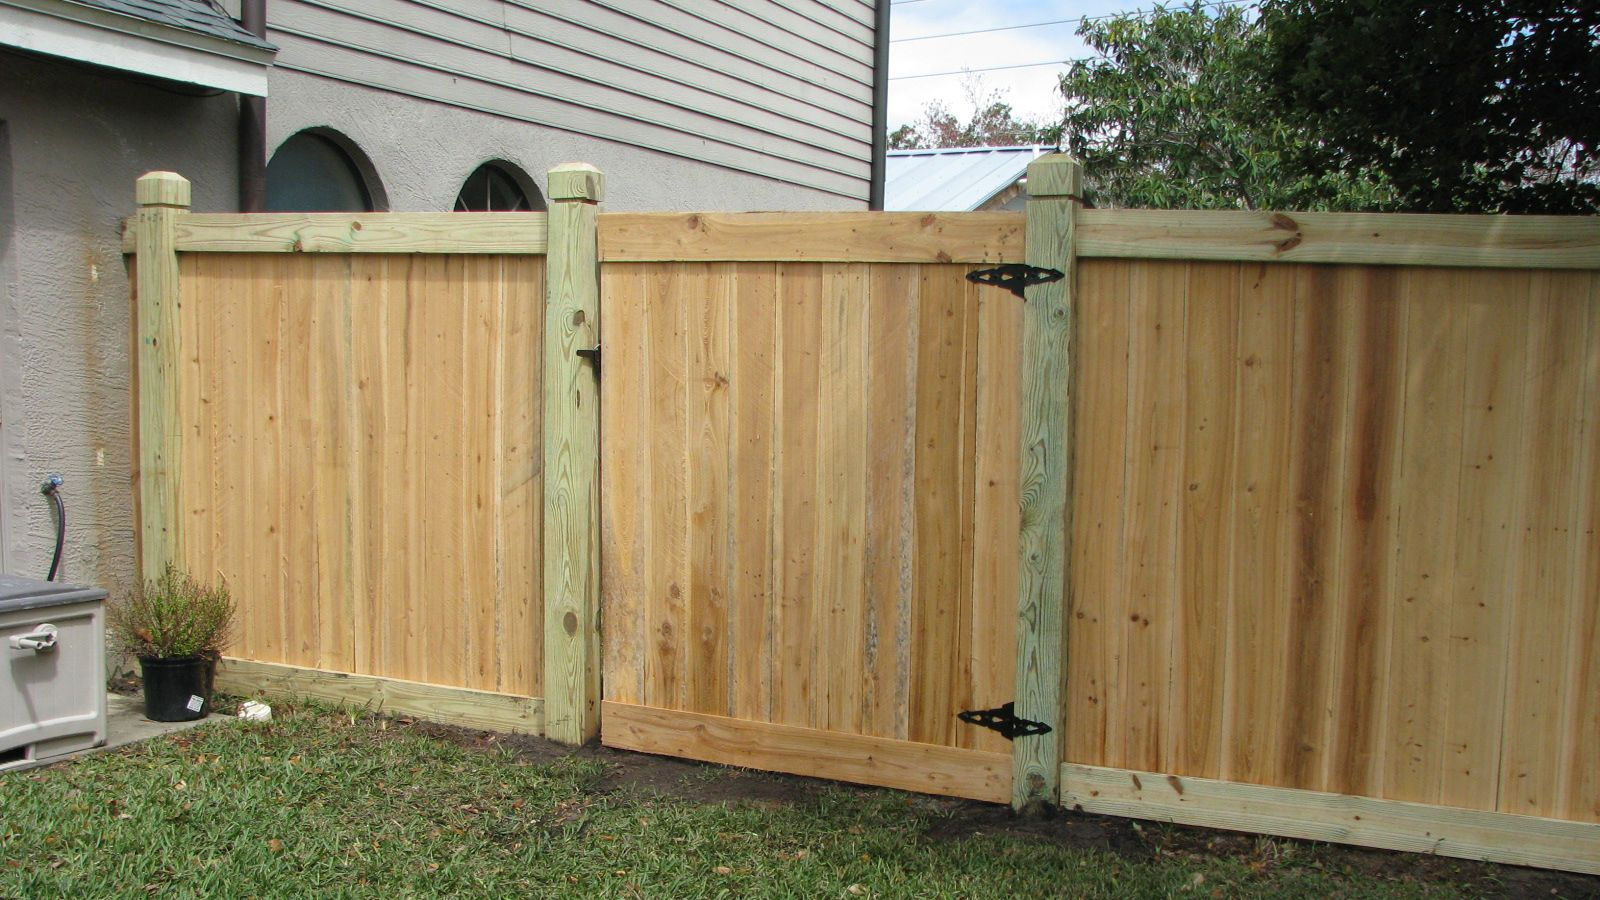 Wood Fences Wood Fence Wood Fence Design Fence Design